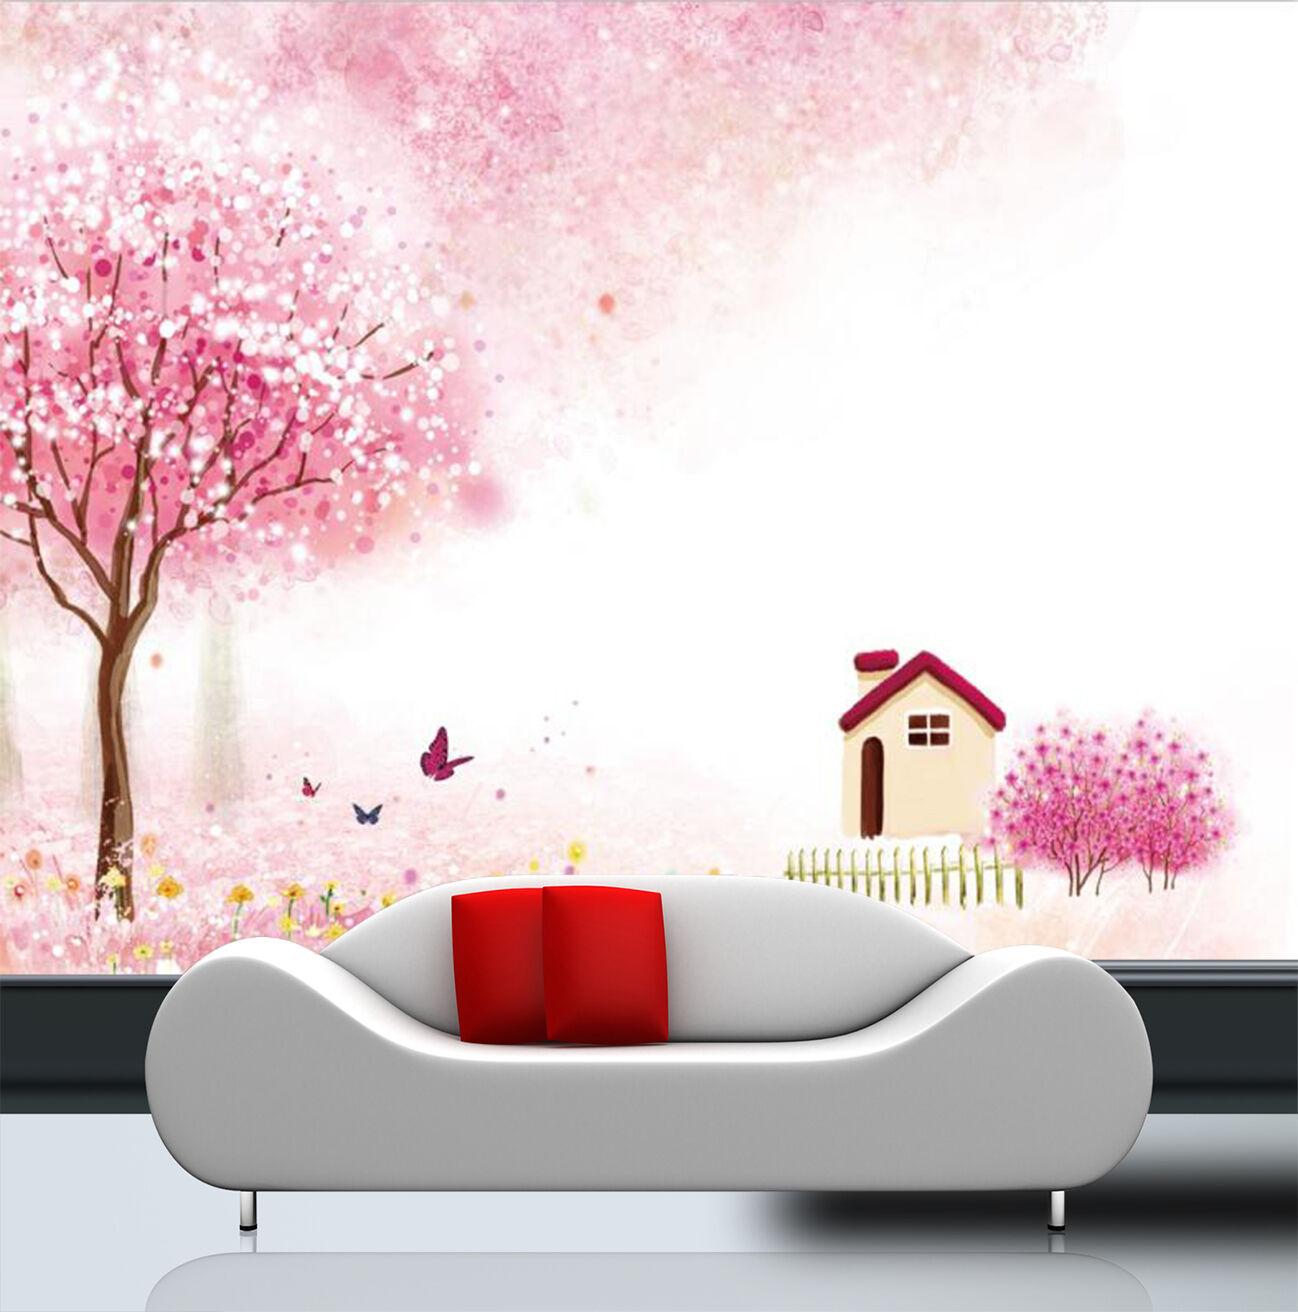 3D Schöne Baumhaus 42 Fototapeten Wandbild Fototapete Bild Tapete Familie Kinder